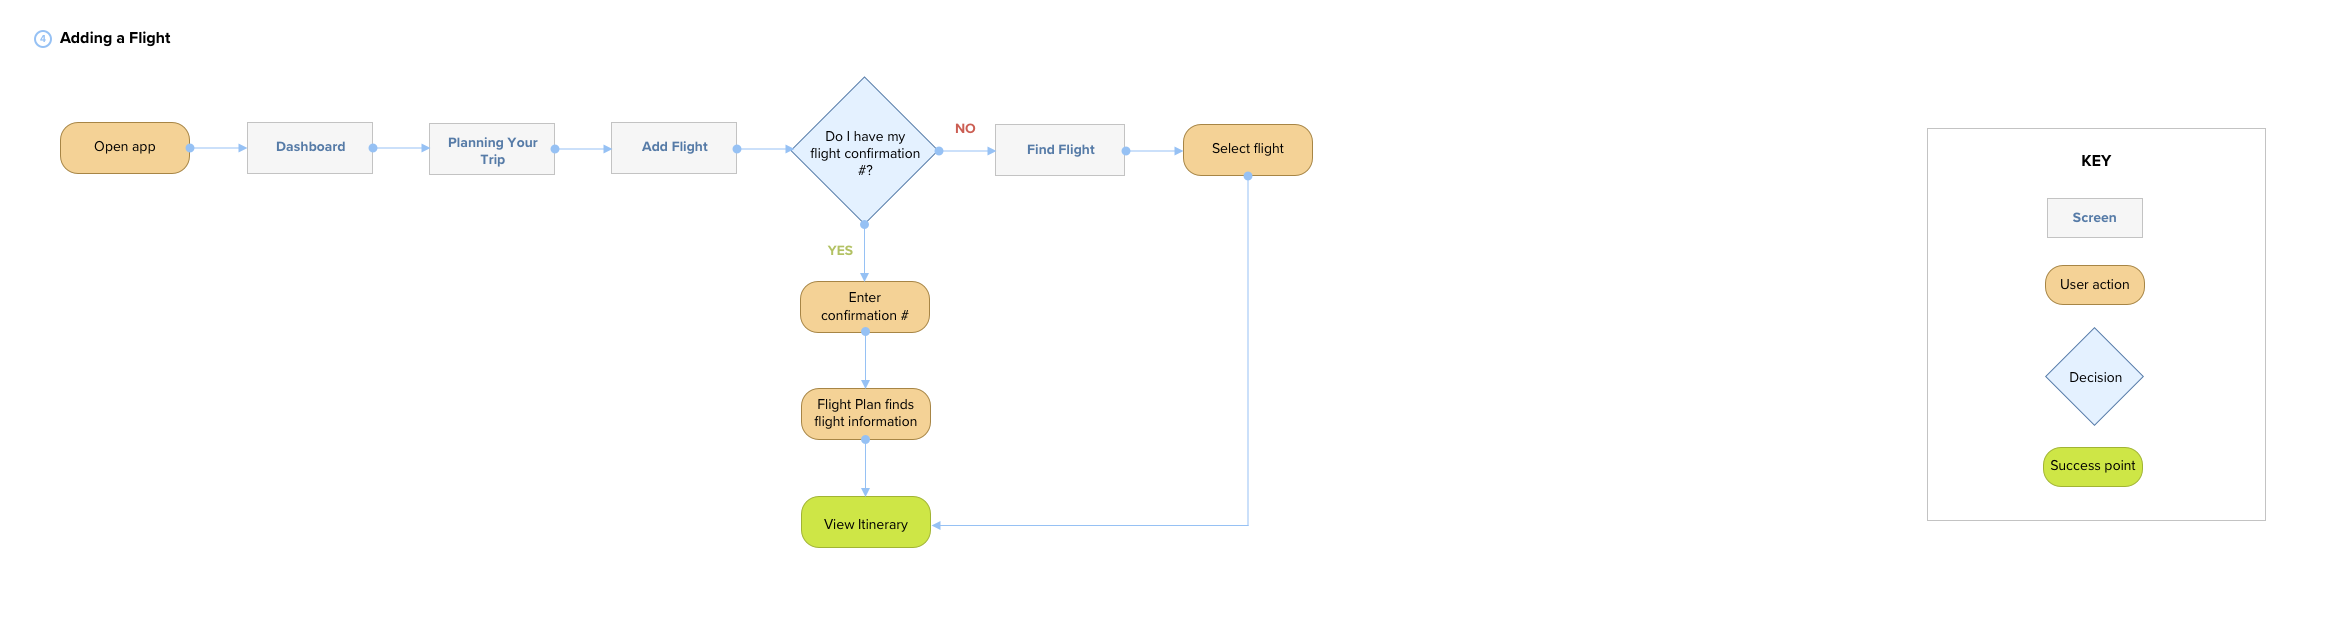 Adding a Flight Task Flow.png